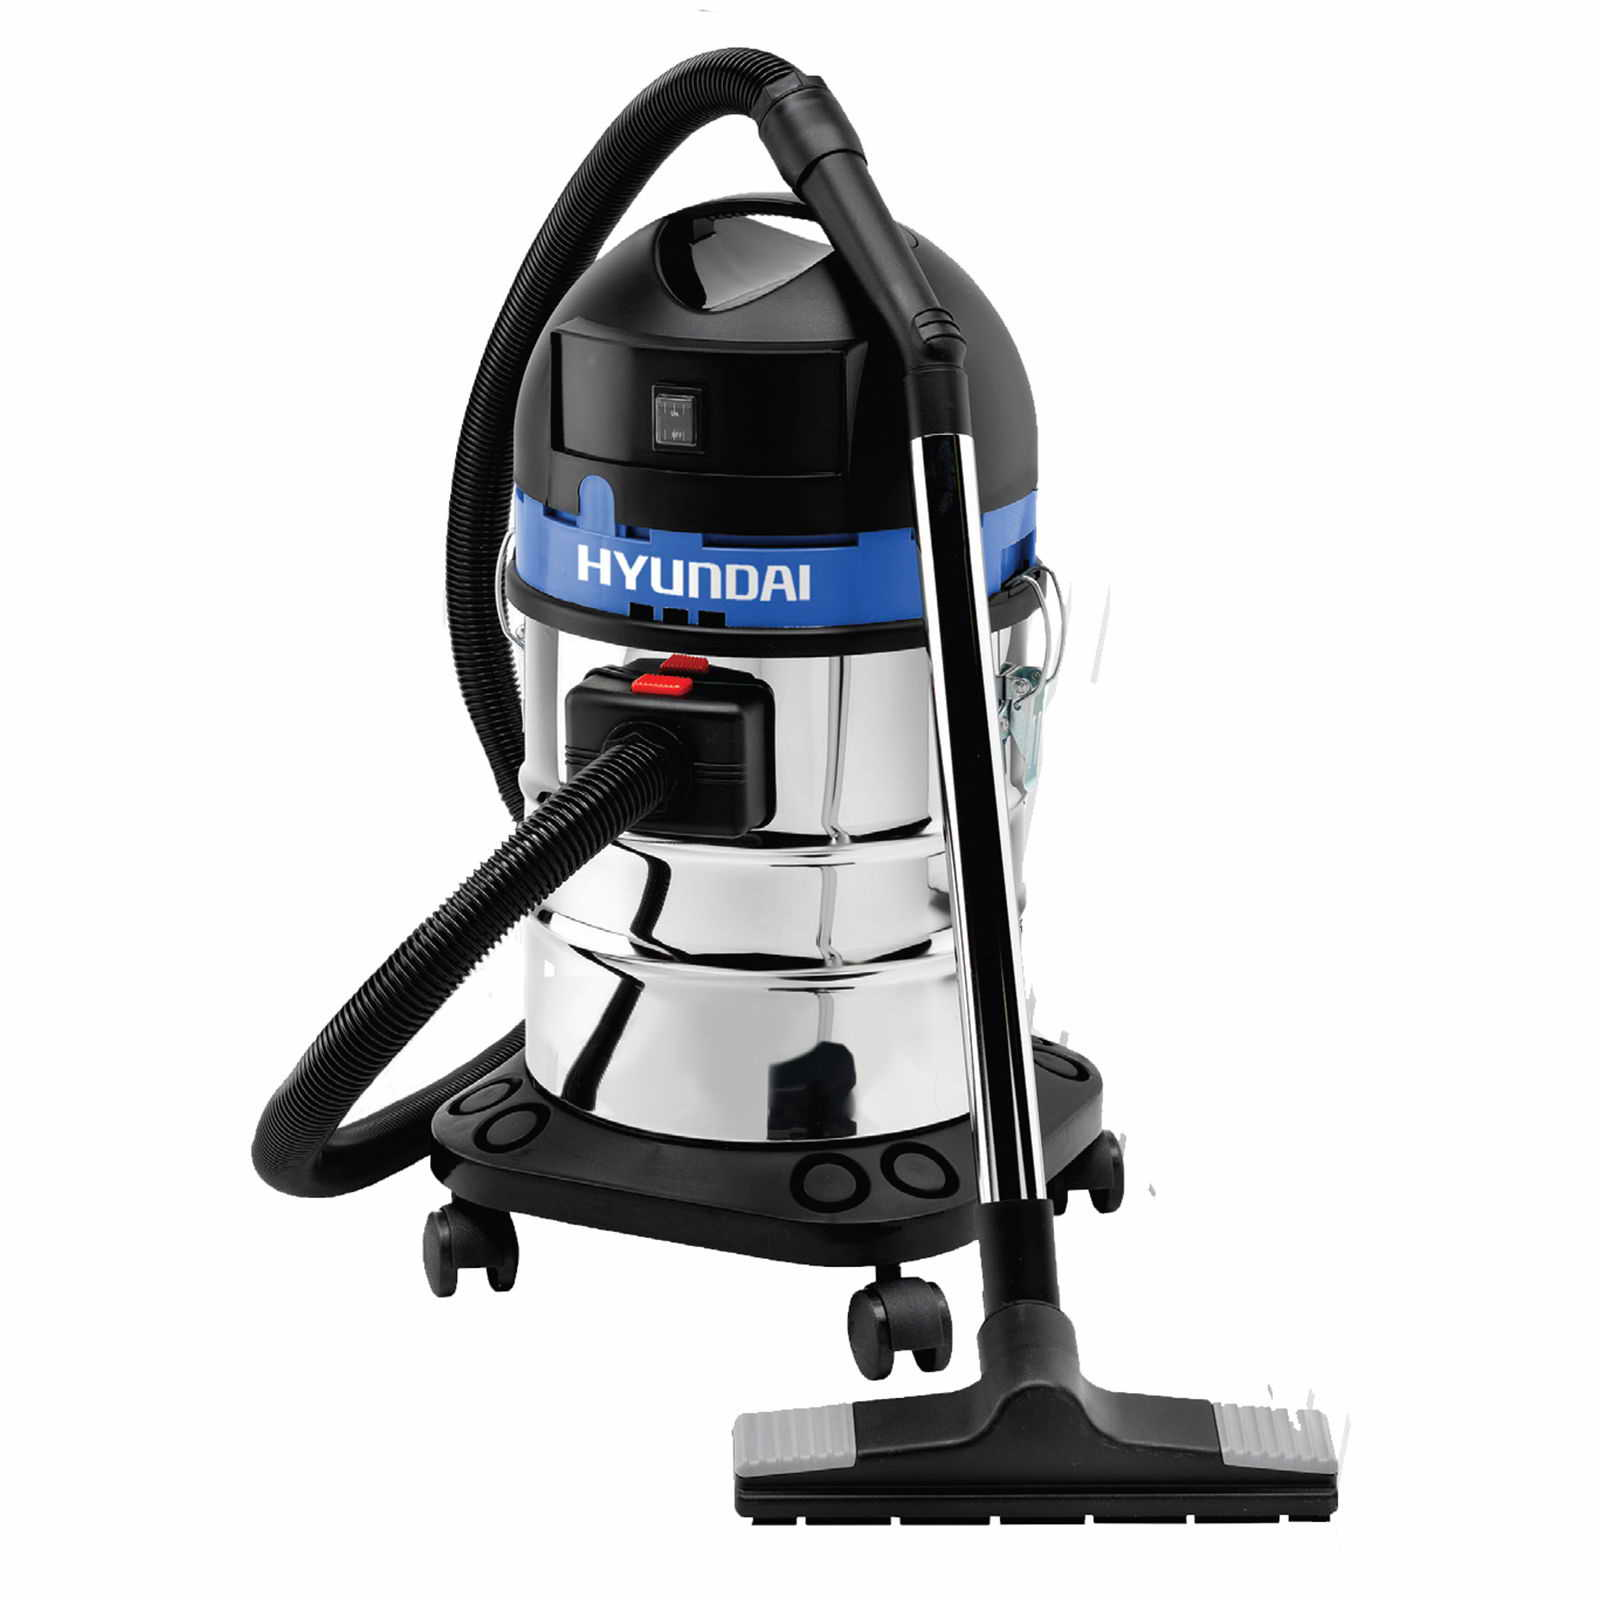 Hyundai Hyvi25 Semi Pro Wet Dry Electric Vacuum Cleaner